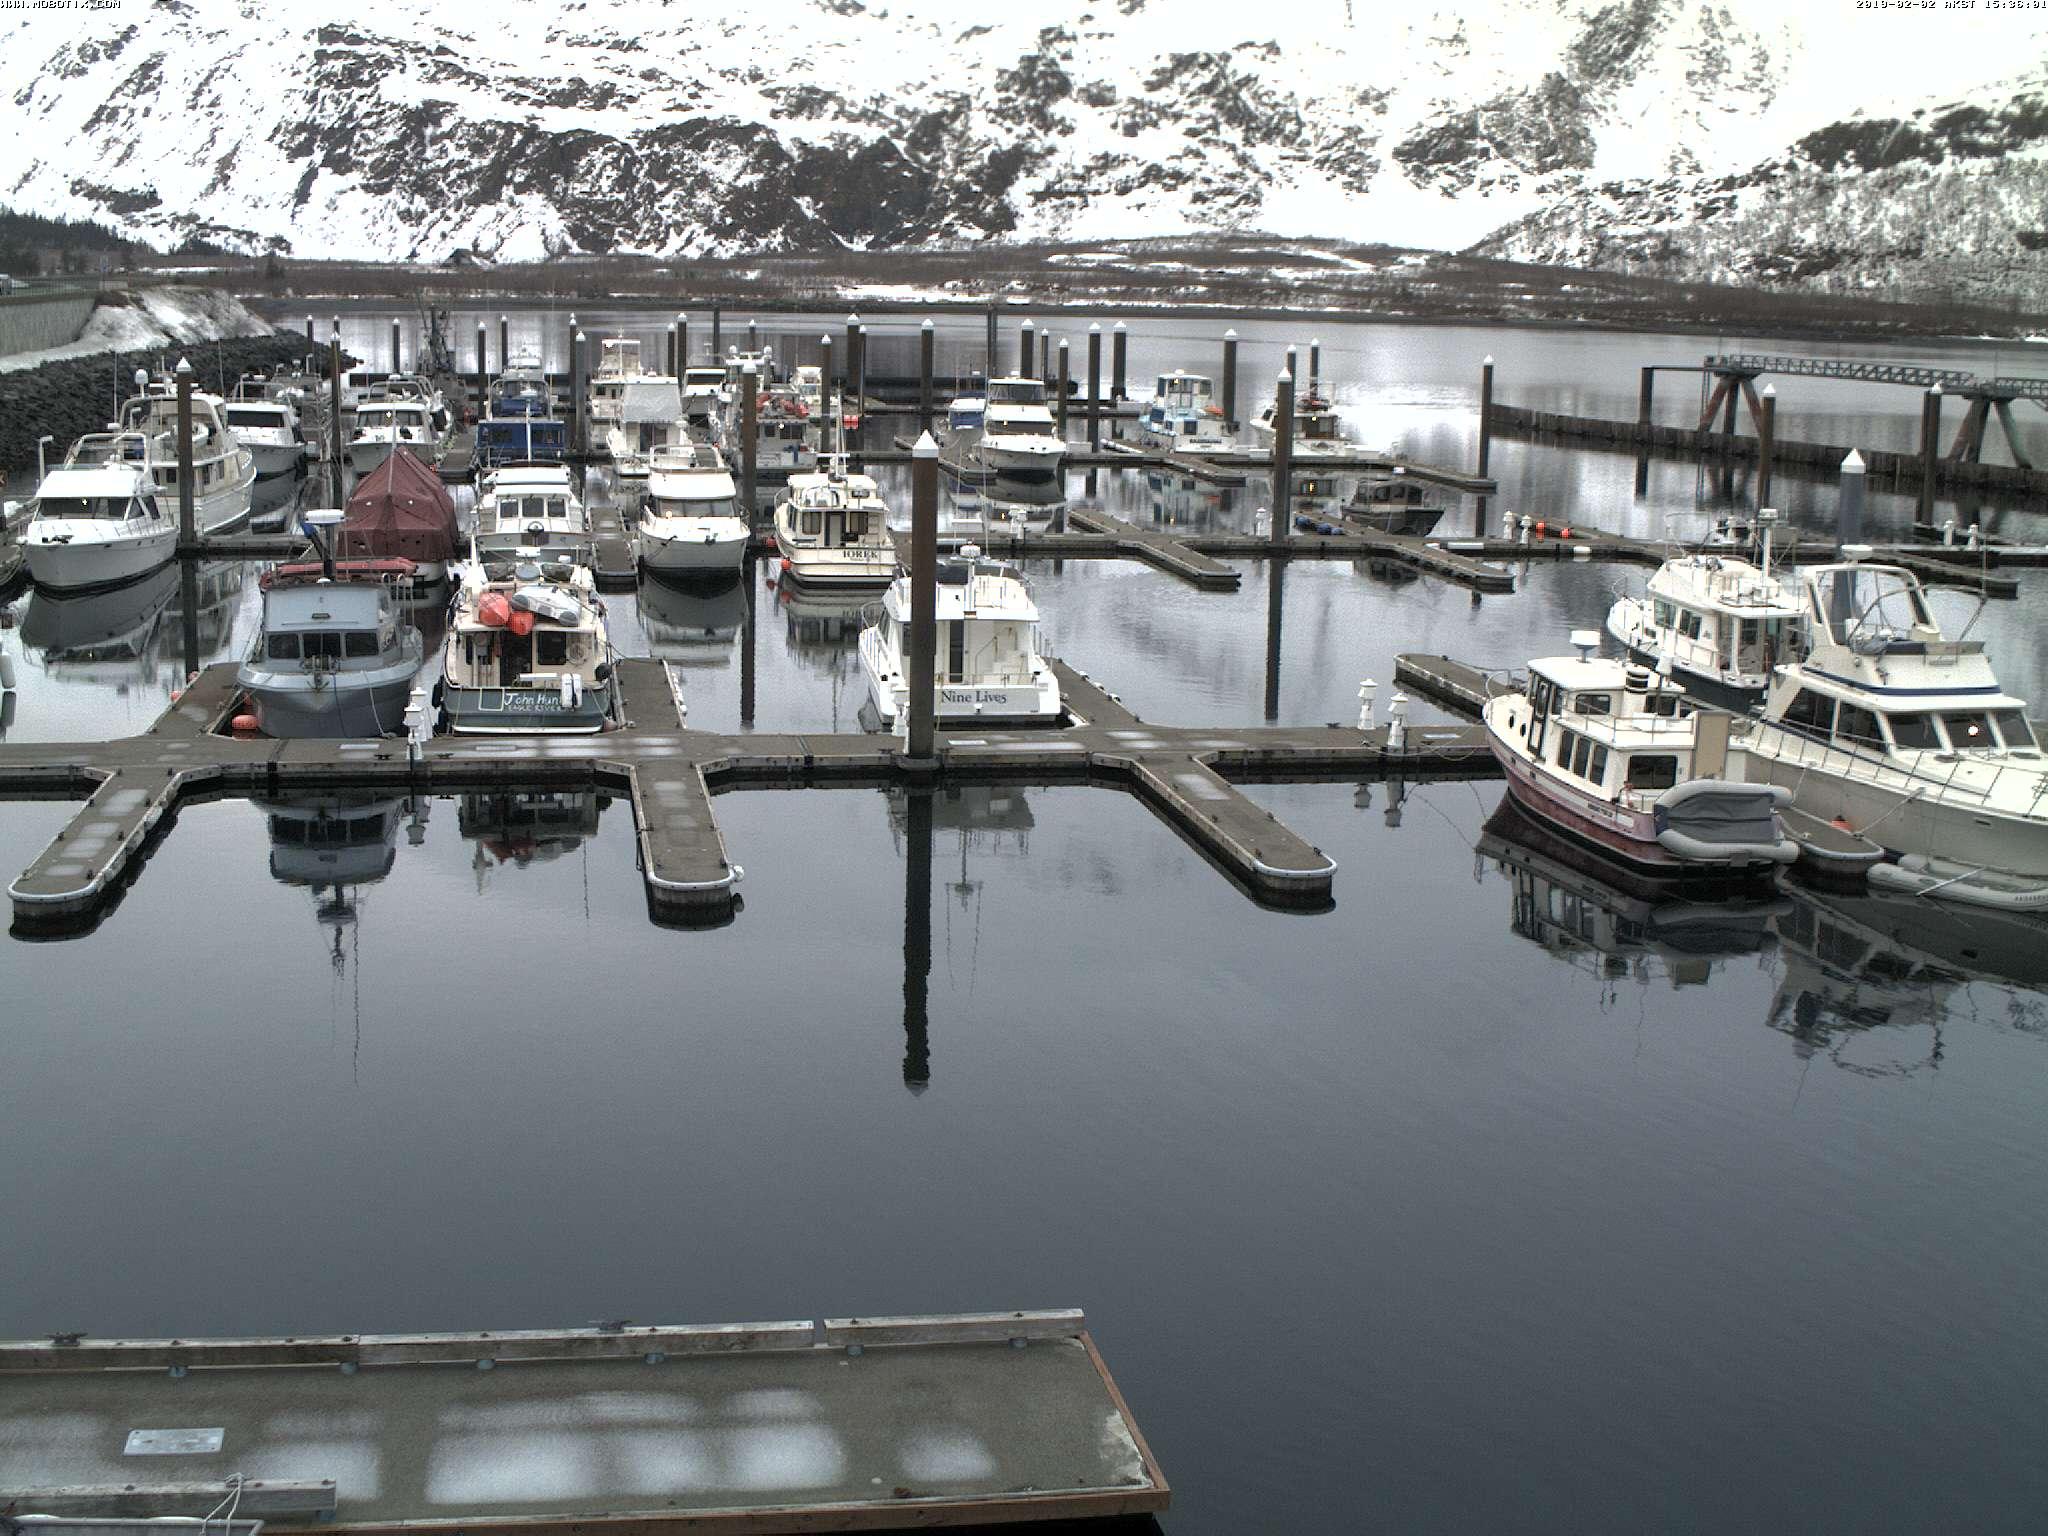 Whittier Alaska cam1